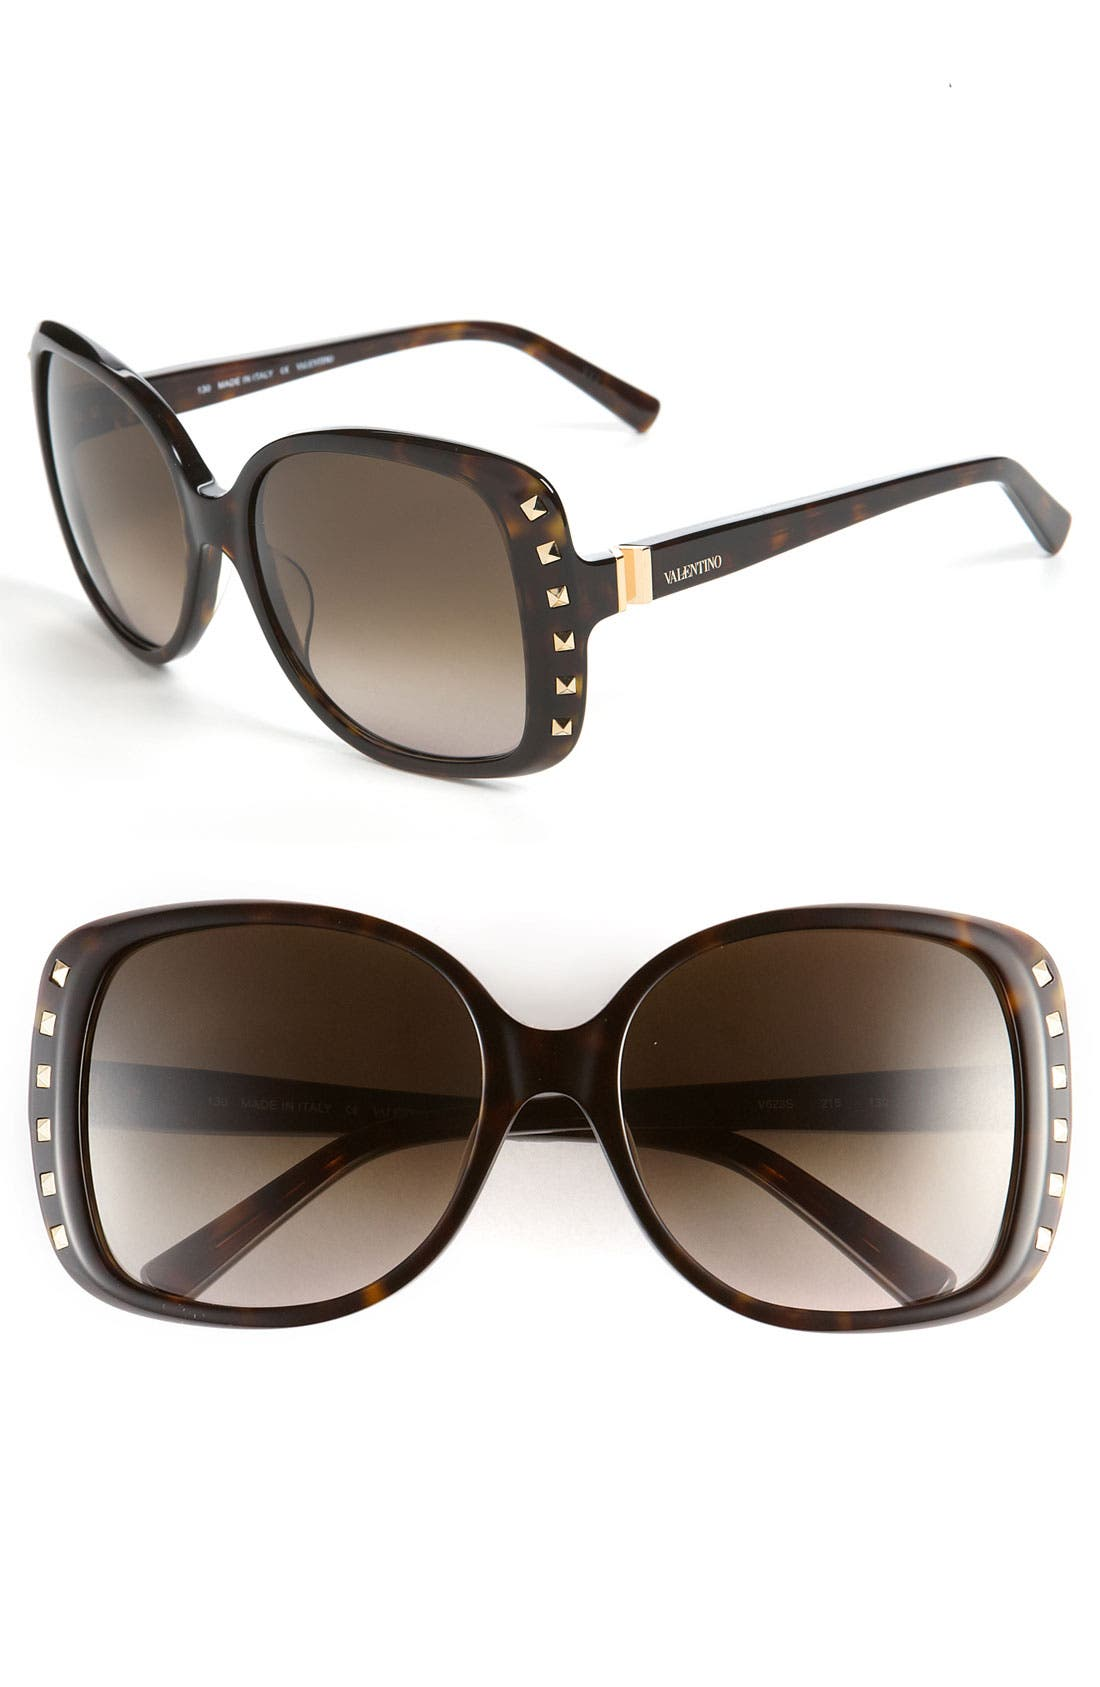 Main Image - Valentino 'Classic' Studded Sunglasses